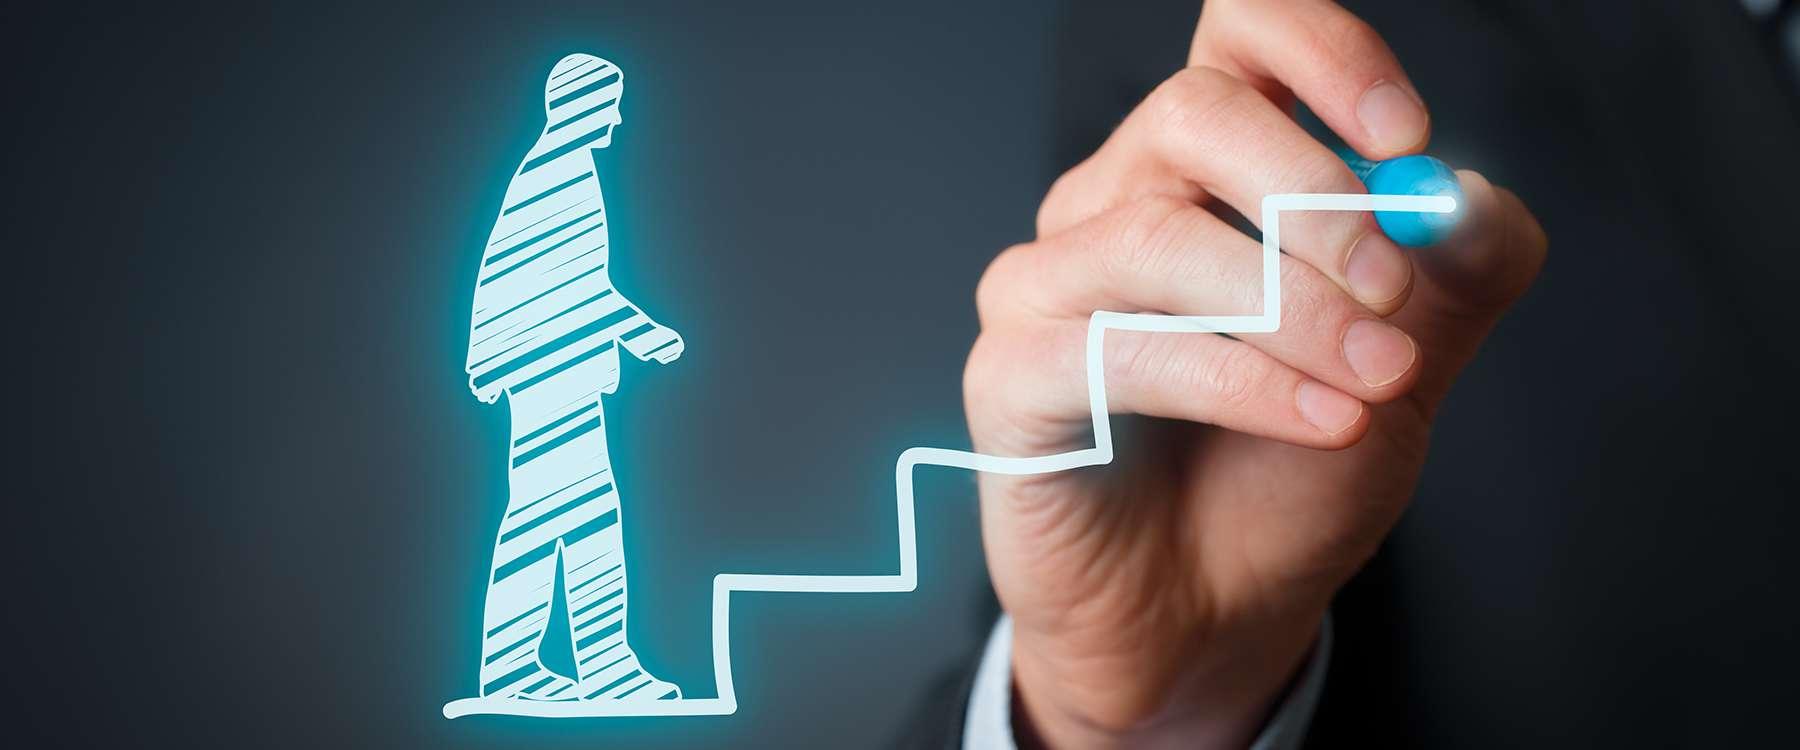 Social Media Mistakes to Avoid While Job Seeking